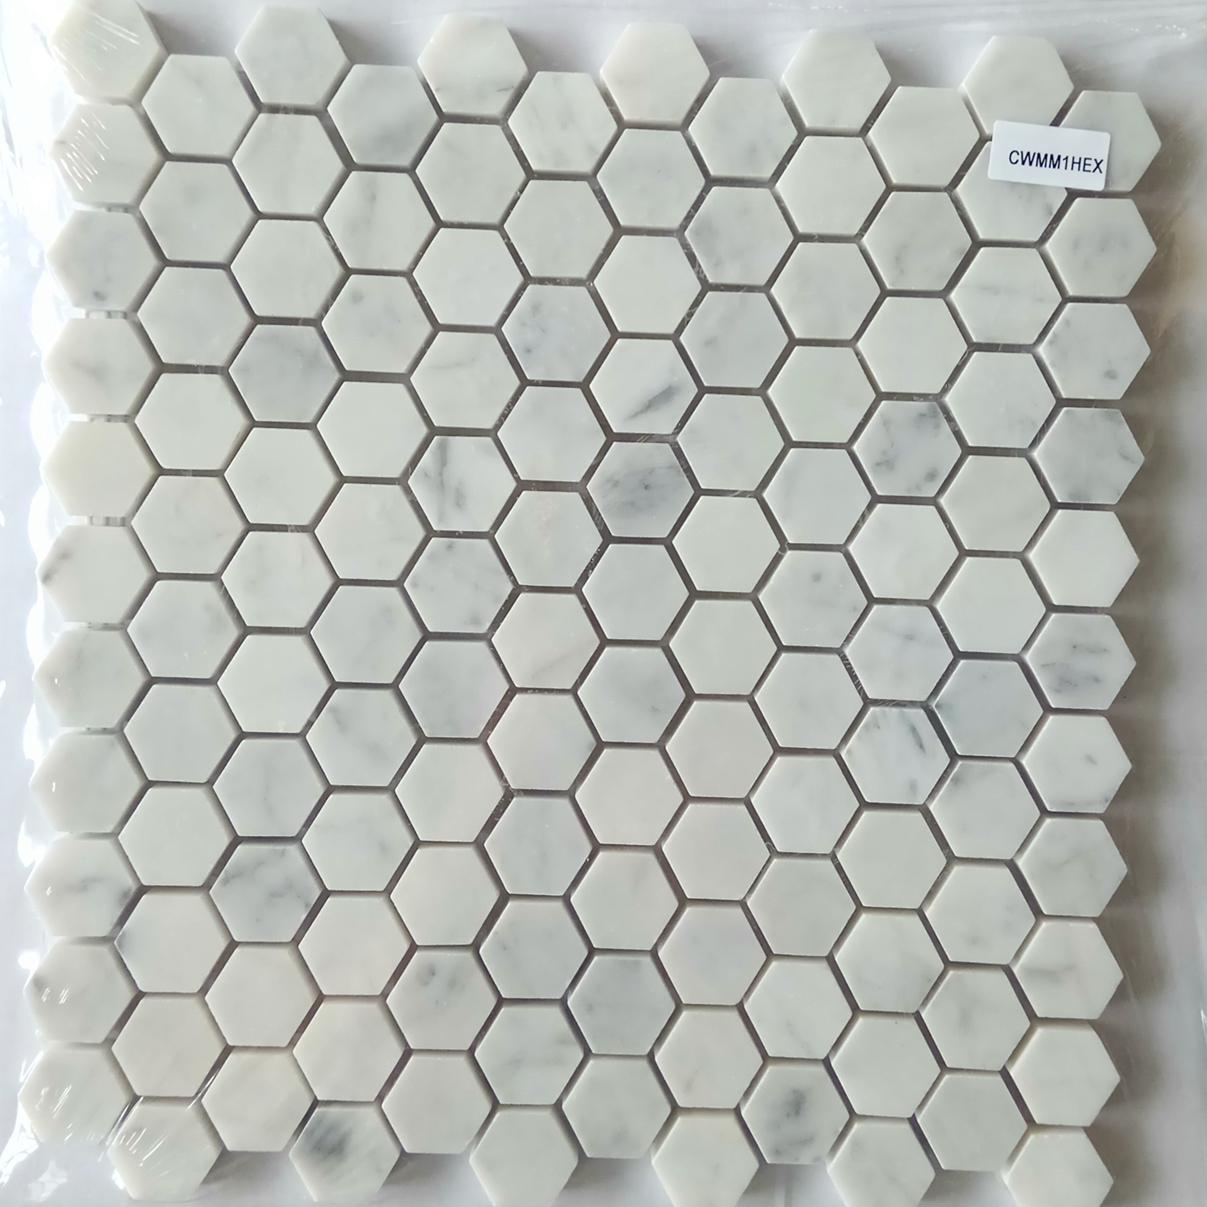 4 Inch Wood White Hexagon Marble Mosaic Floor Tile Tiles Product On Alibaba